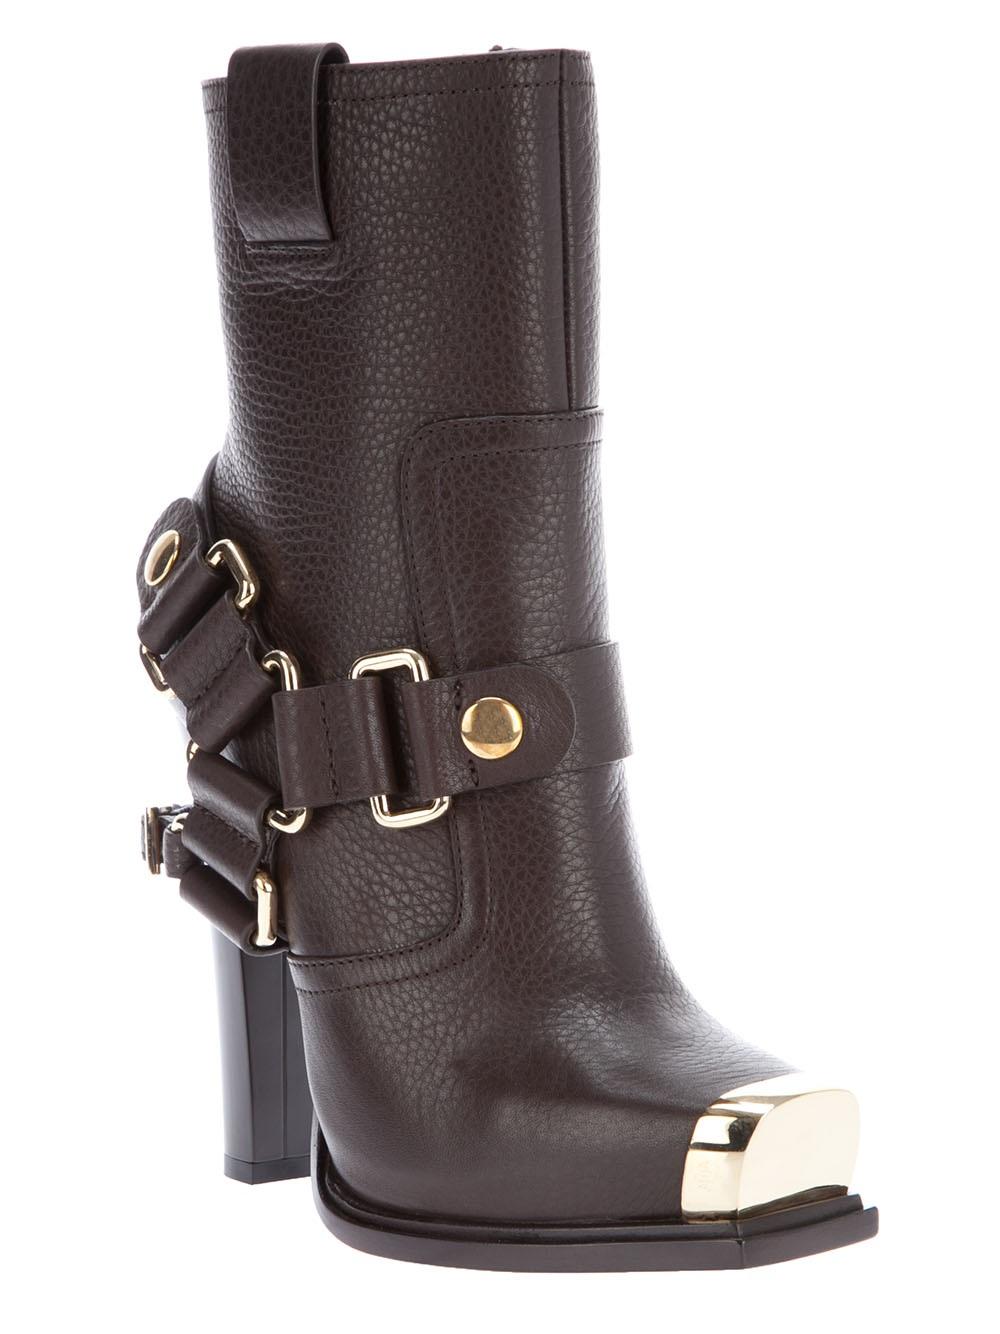 gianmarco lorenzi high heel boot in brown lyst